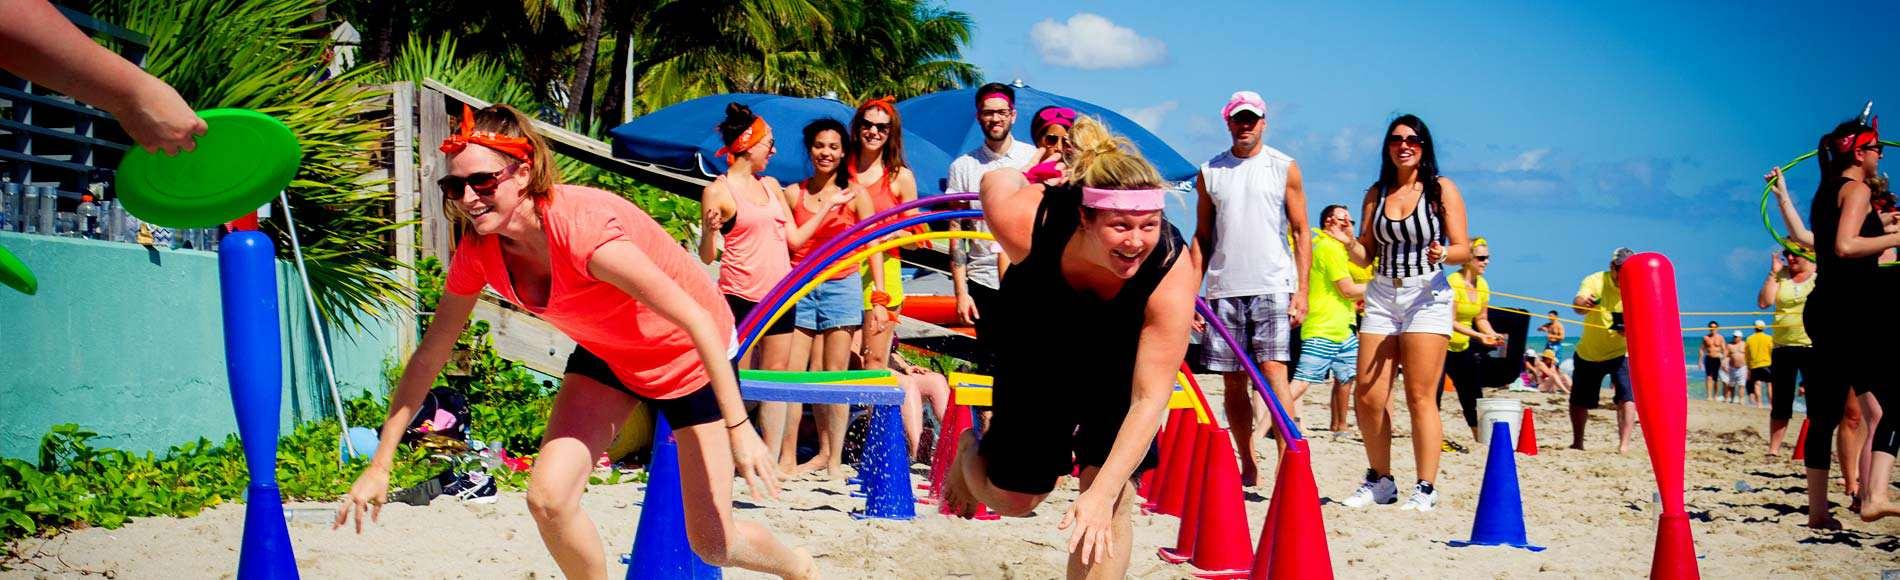 beach_olympics_slide